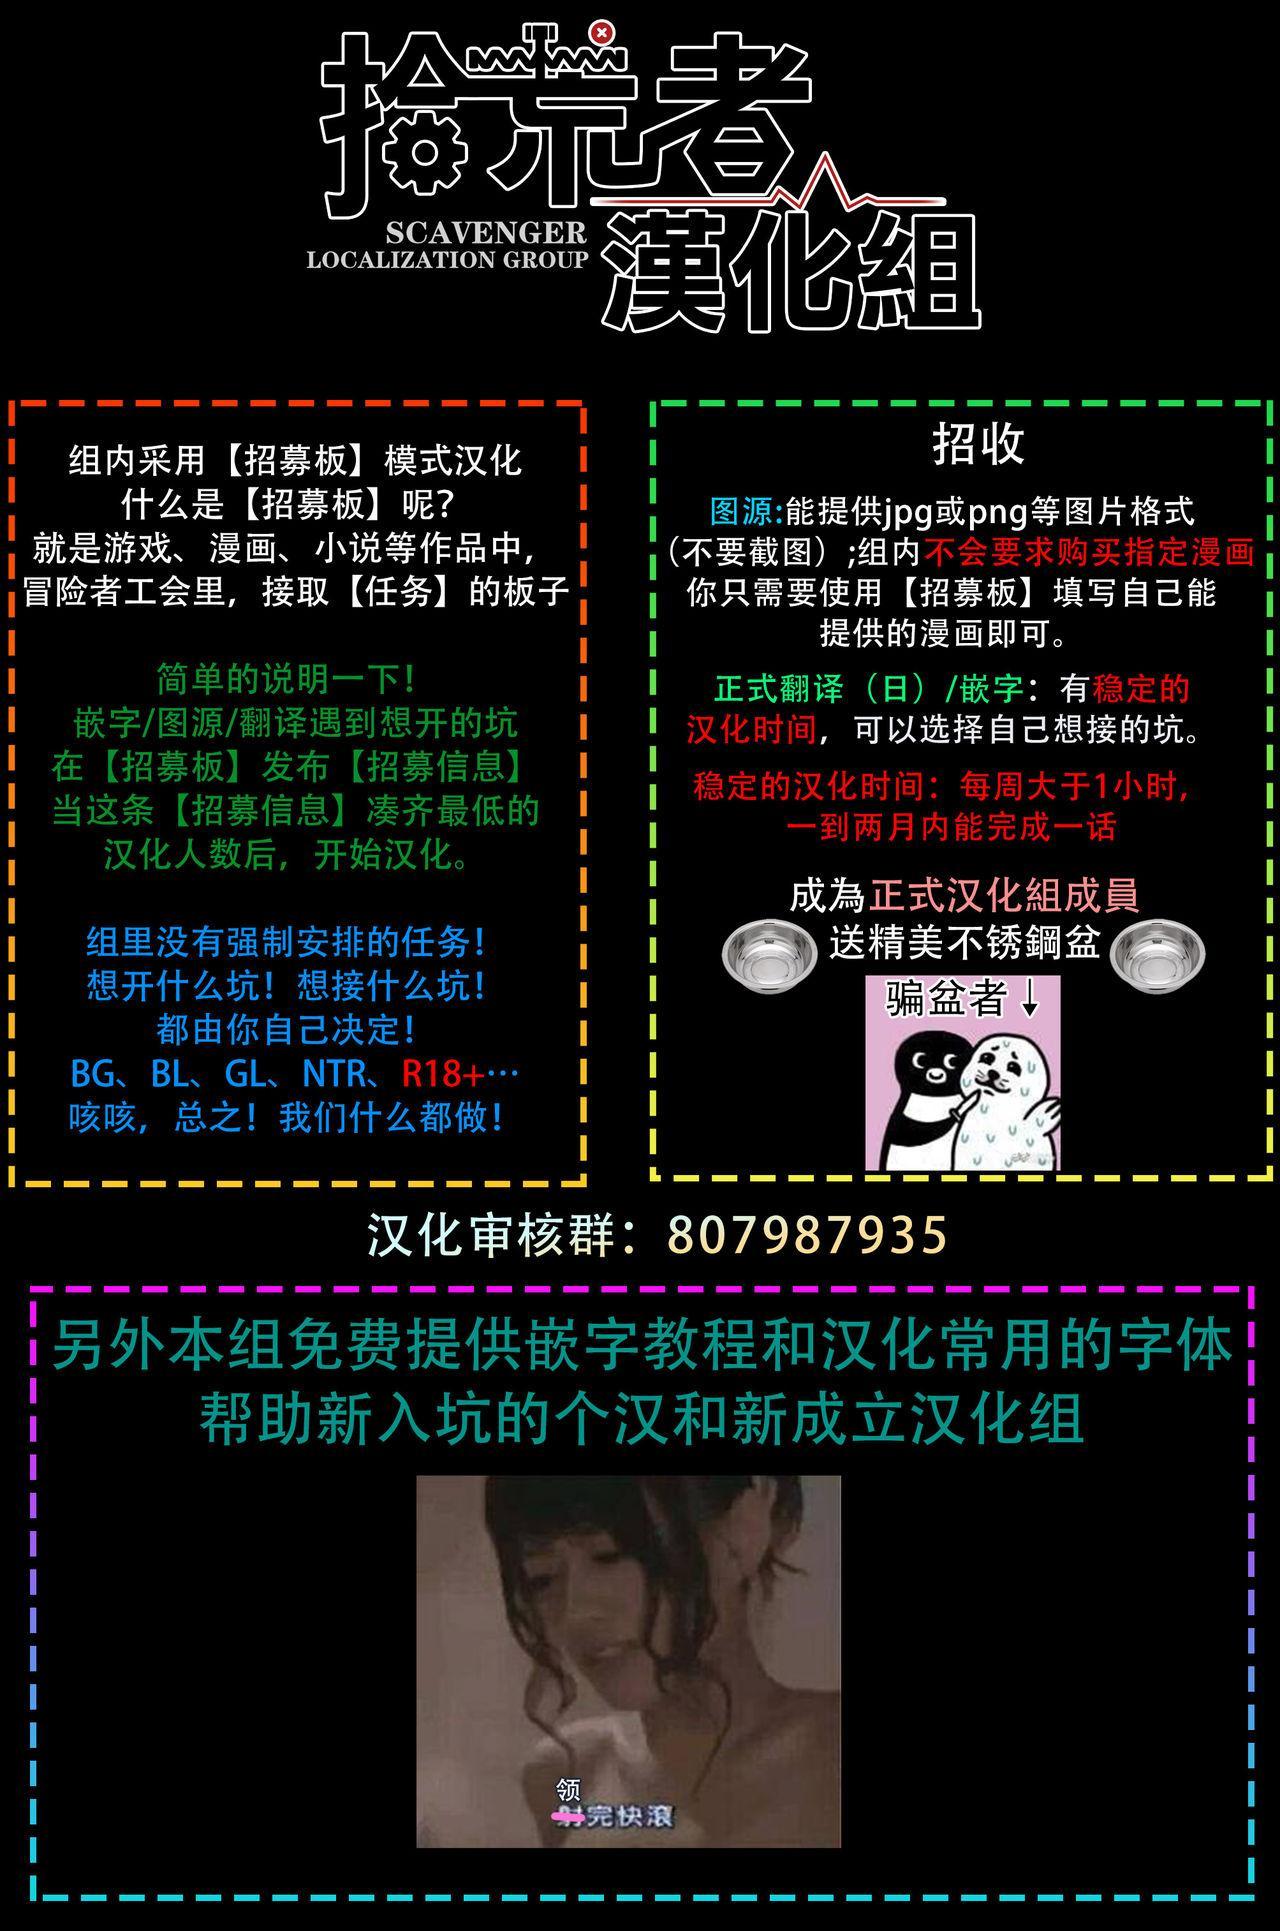 [Yao] Inma-sama ni Hallelujah!   赞美淫魔大人! Ch. 1-3 [Chinese] [拾荒者汉化组] [Digital] 108